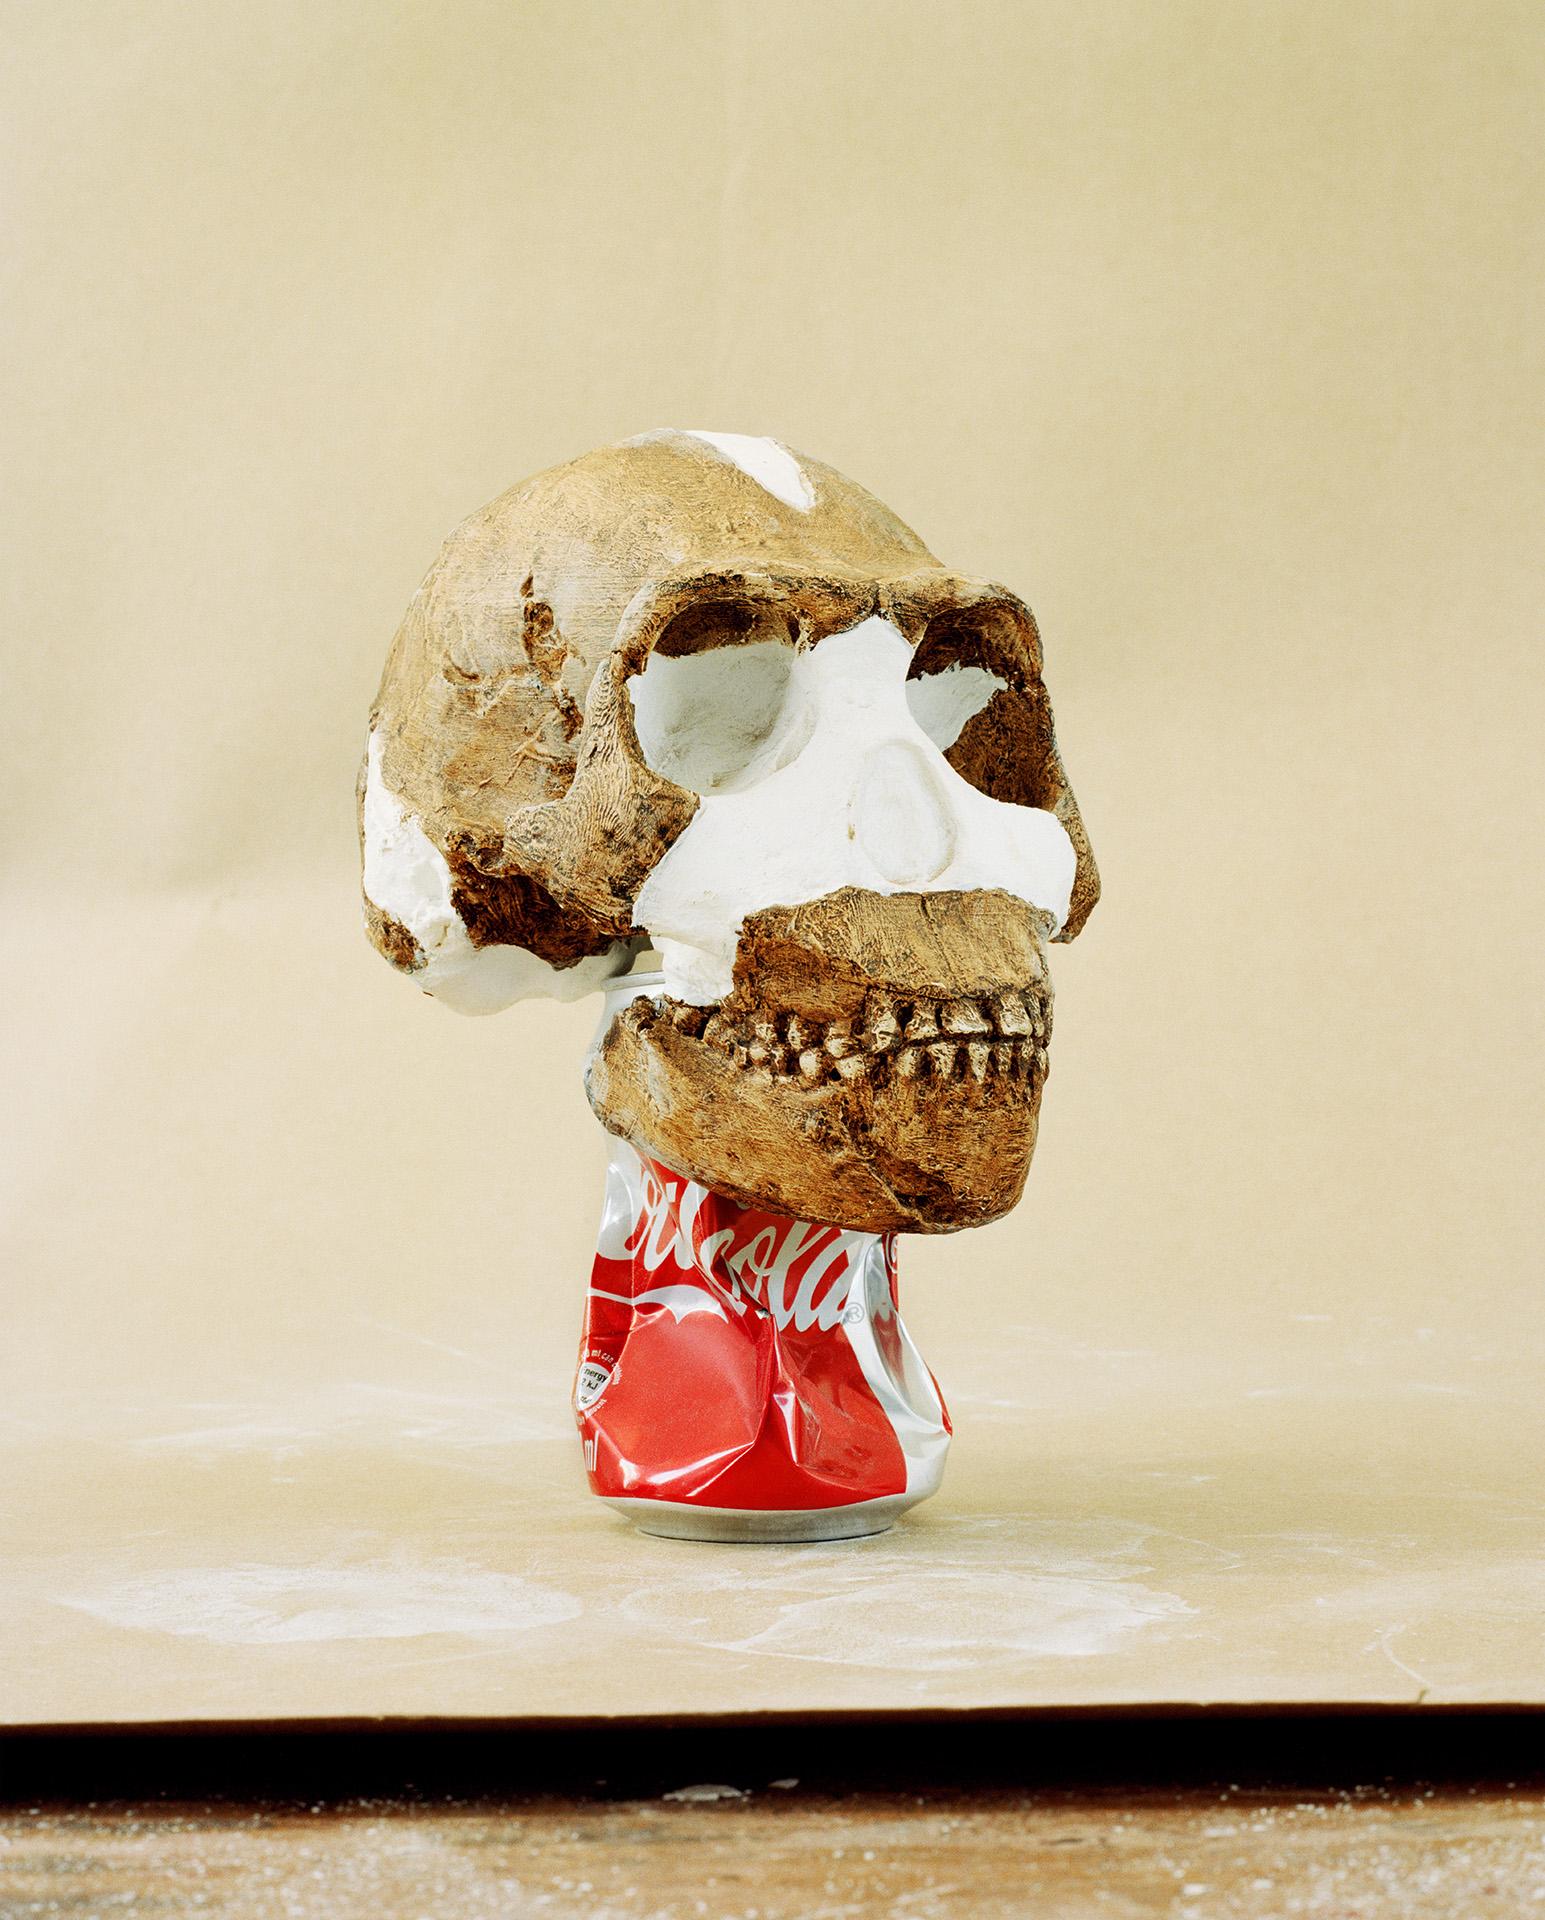 The Cool Couple, Skull - Time Travel Stuff, 2018, inkjet print on fine art paper, 70 x 55 cm